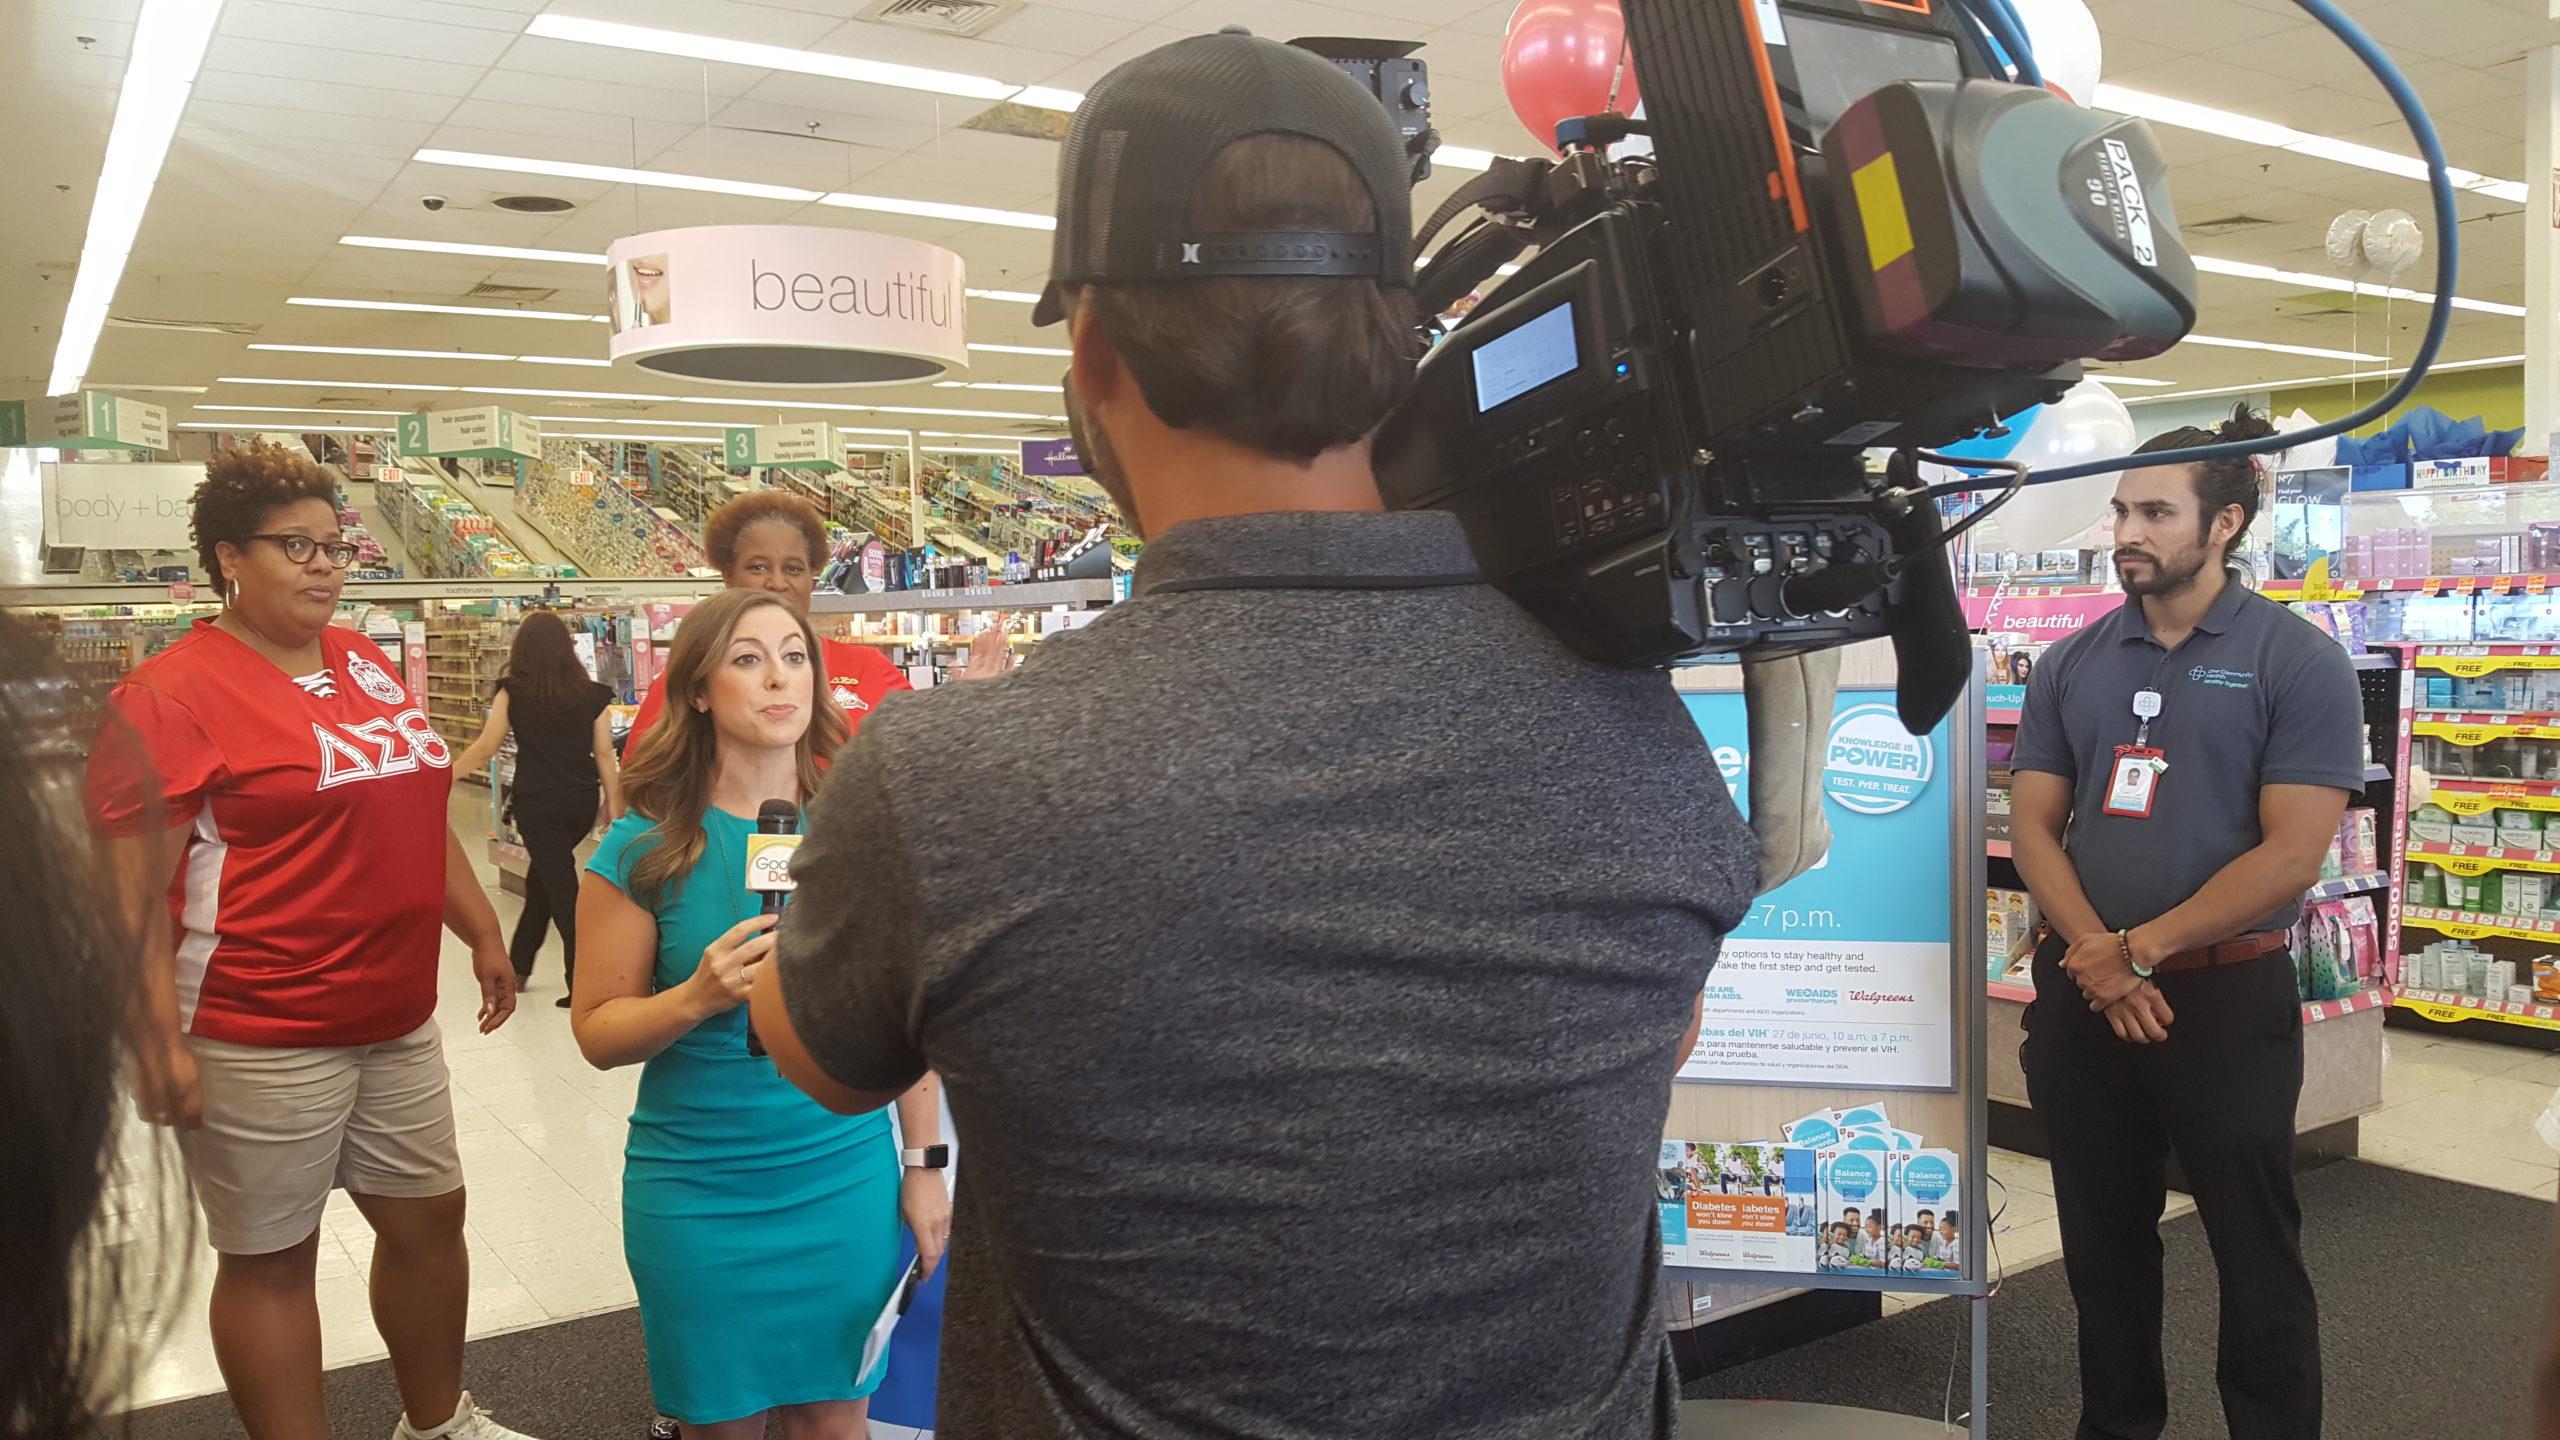 Filming in Walgreens